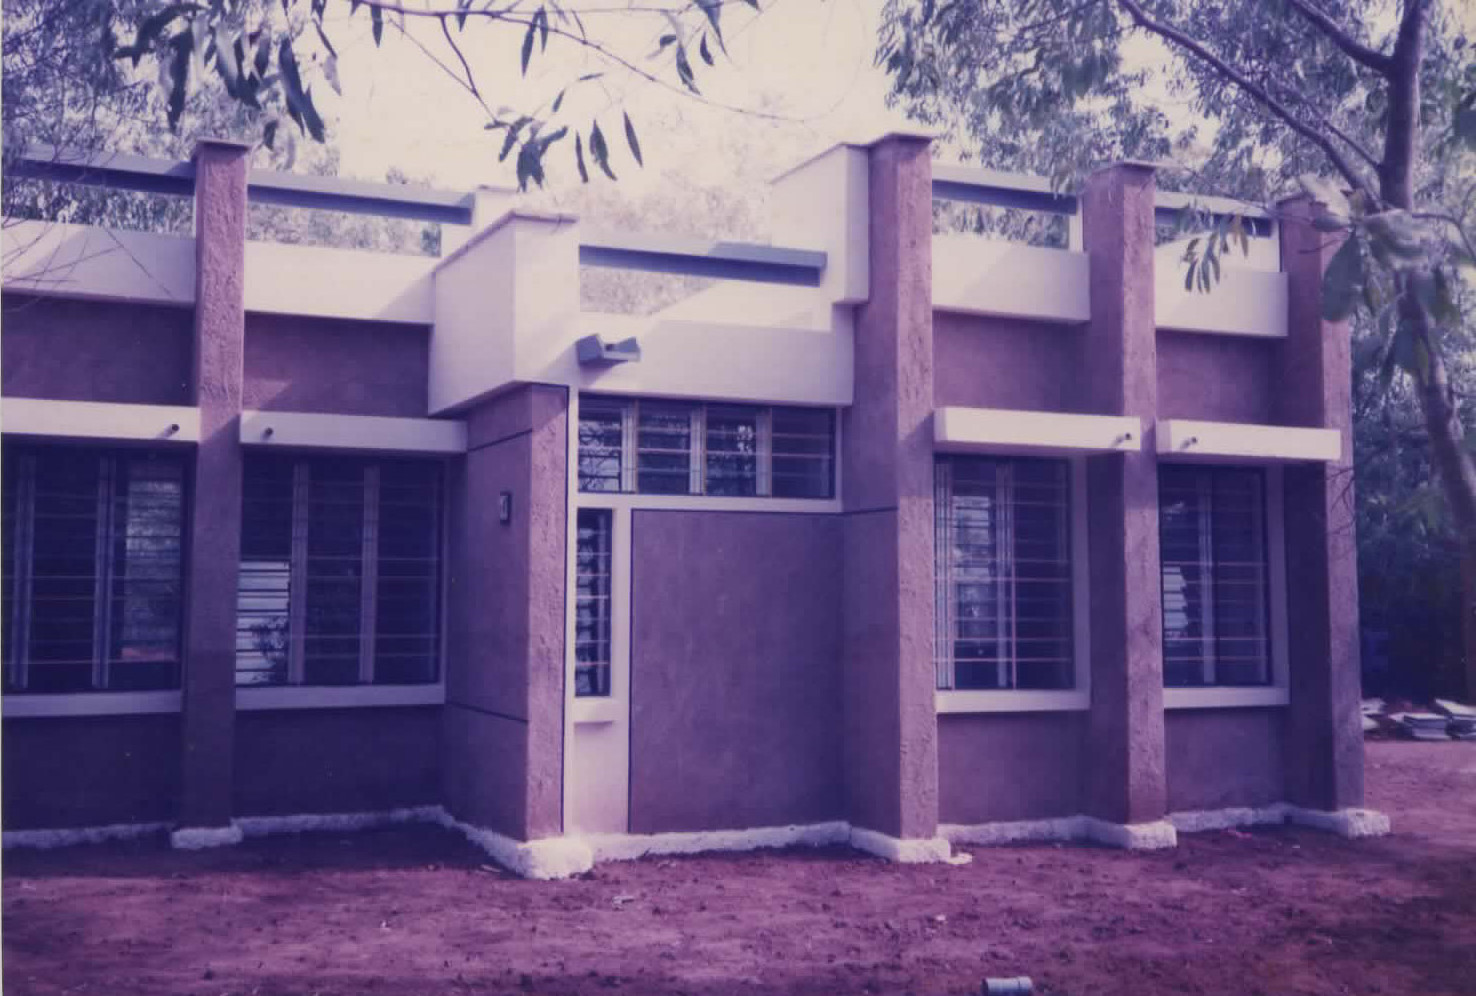 New comer house - Dana, 1995